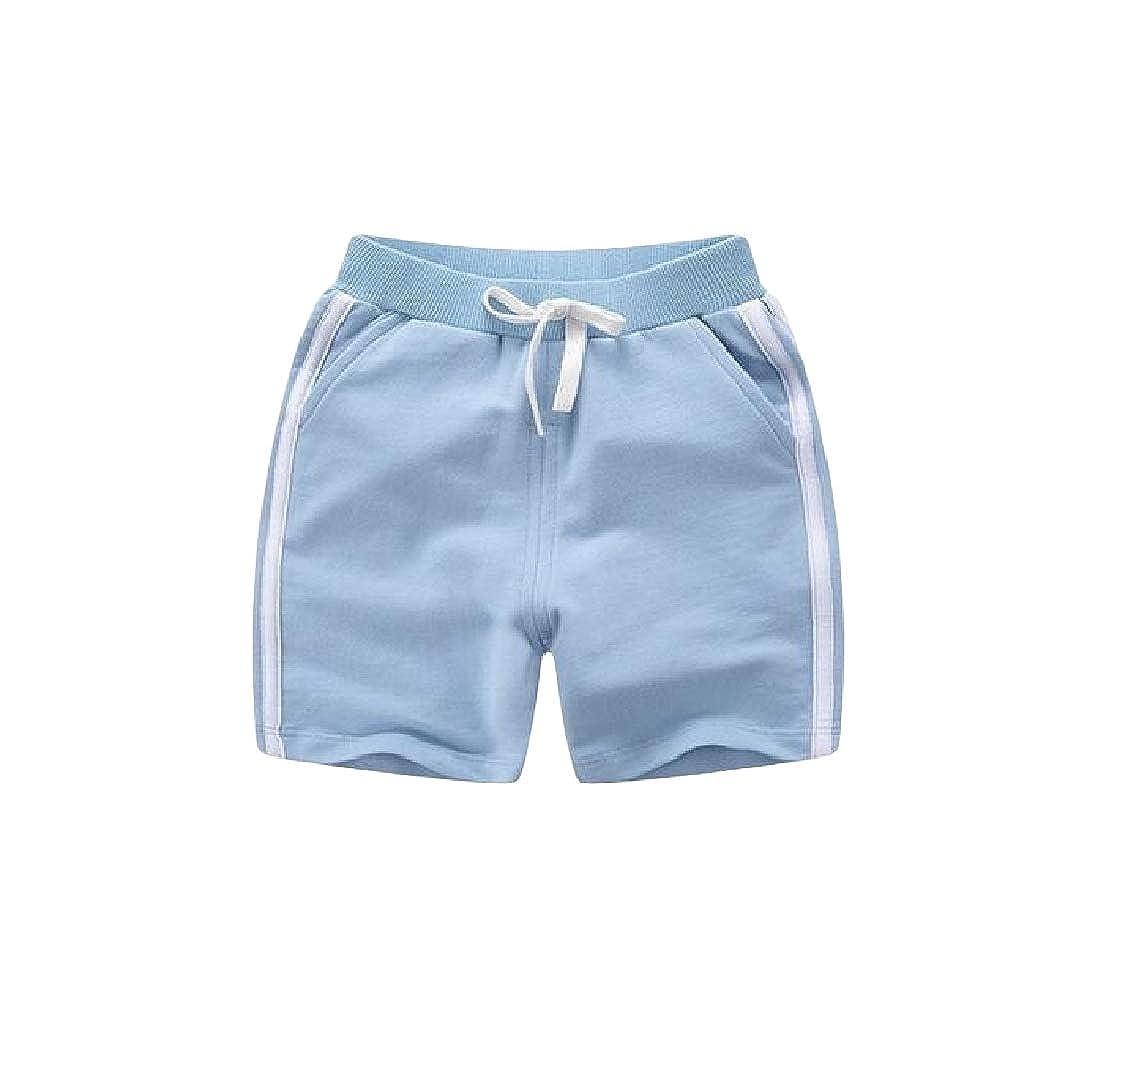 pipigo Girl Fit Striped Sport Cute Elastic Waist Short